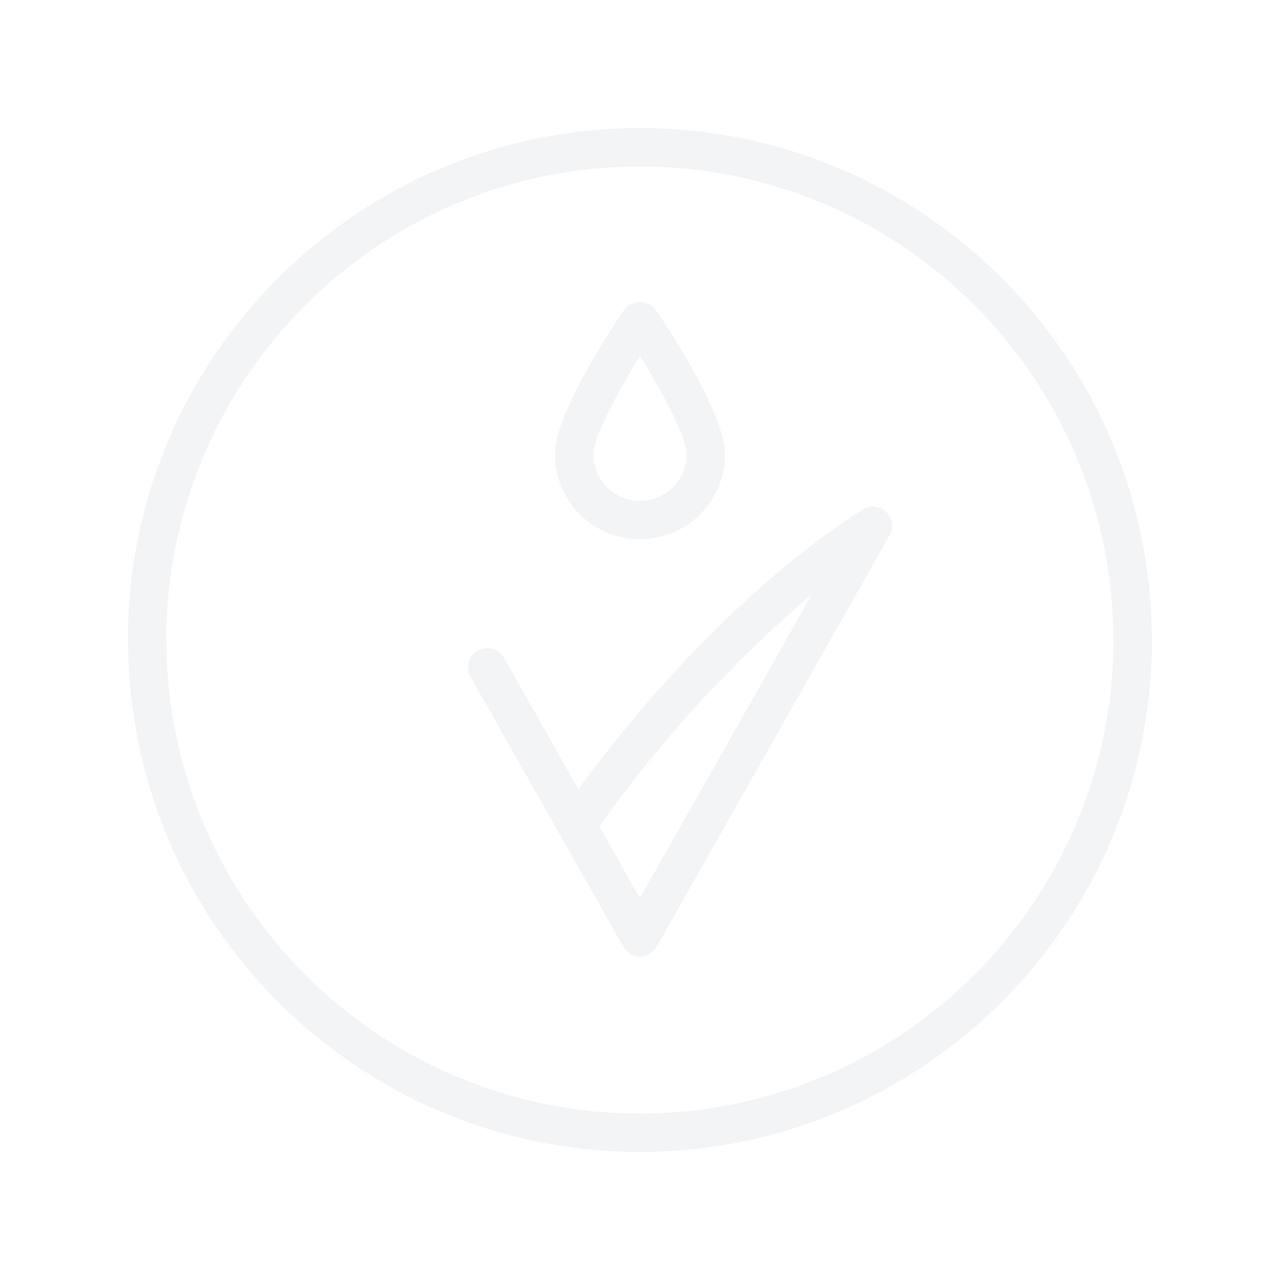 MACADAMIA Professional Whipped Detailing Cream 57g